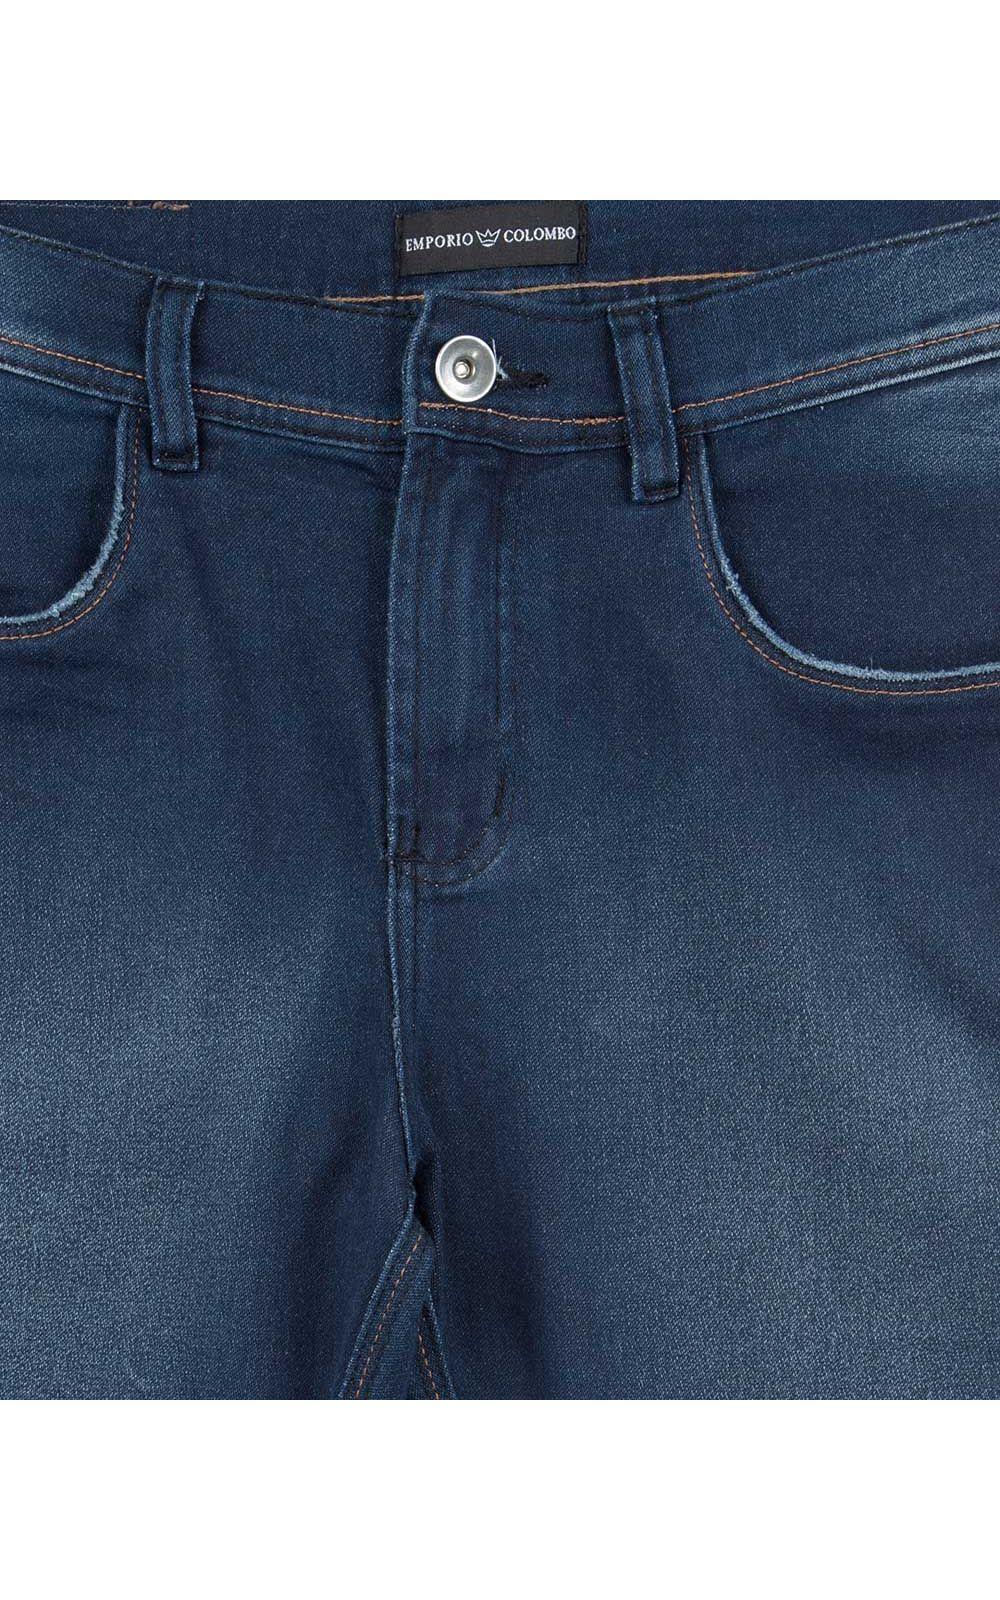 Foto 4 - Calça Jeans Masculina Azul Lisa